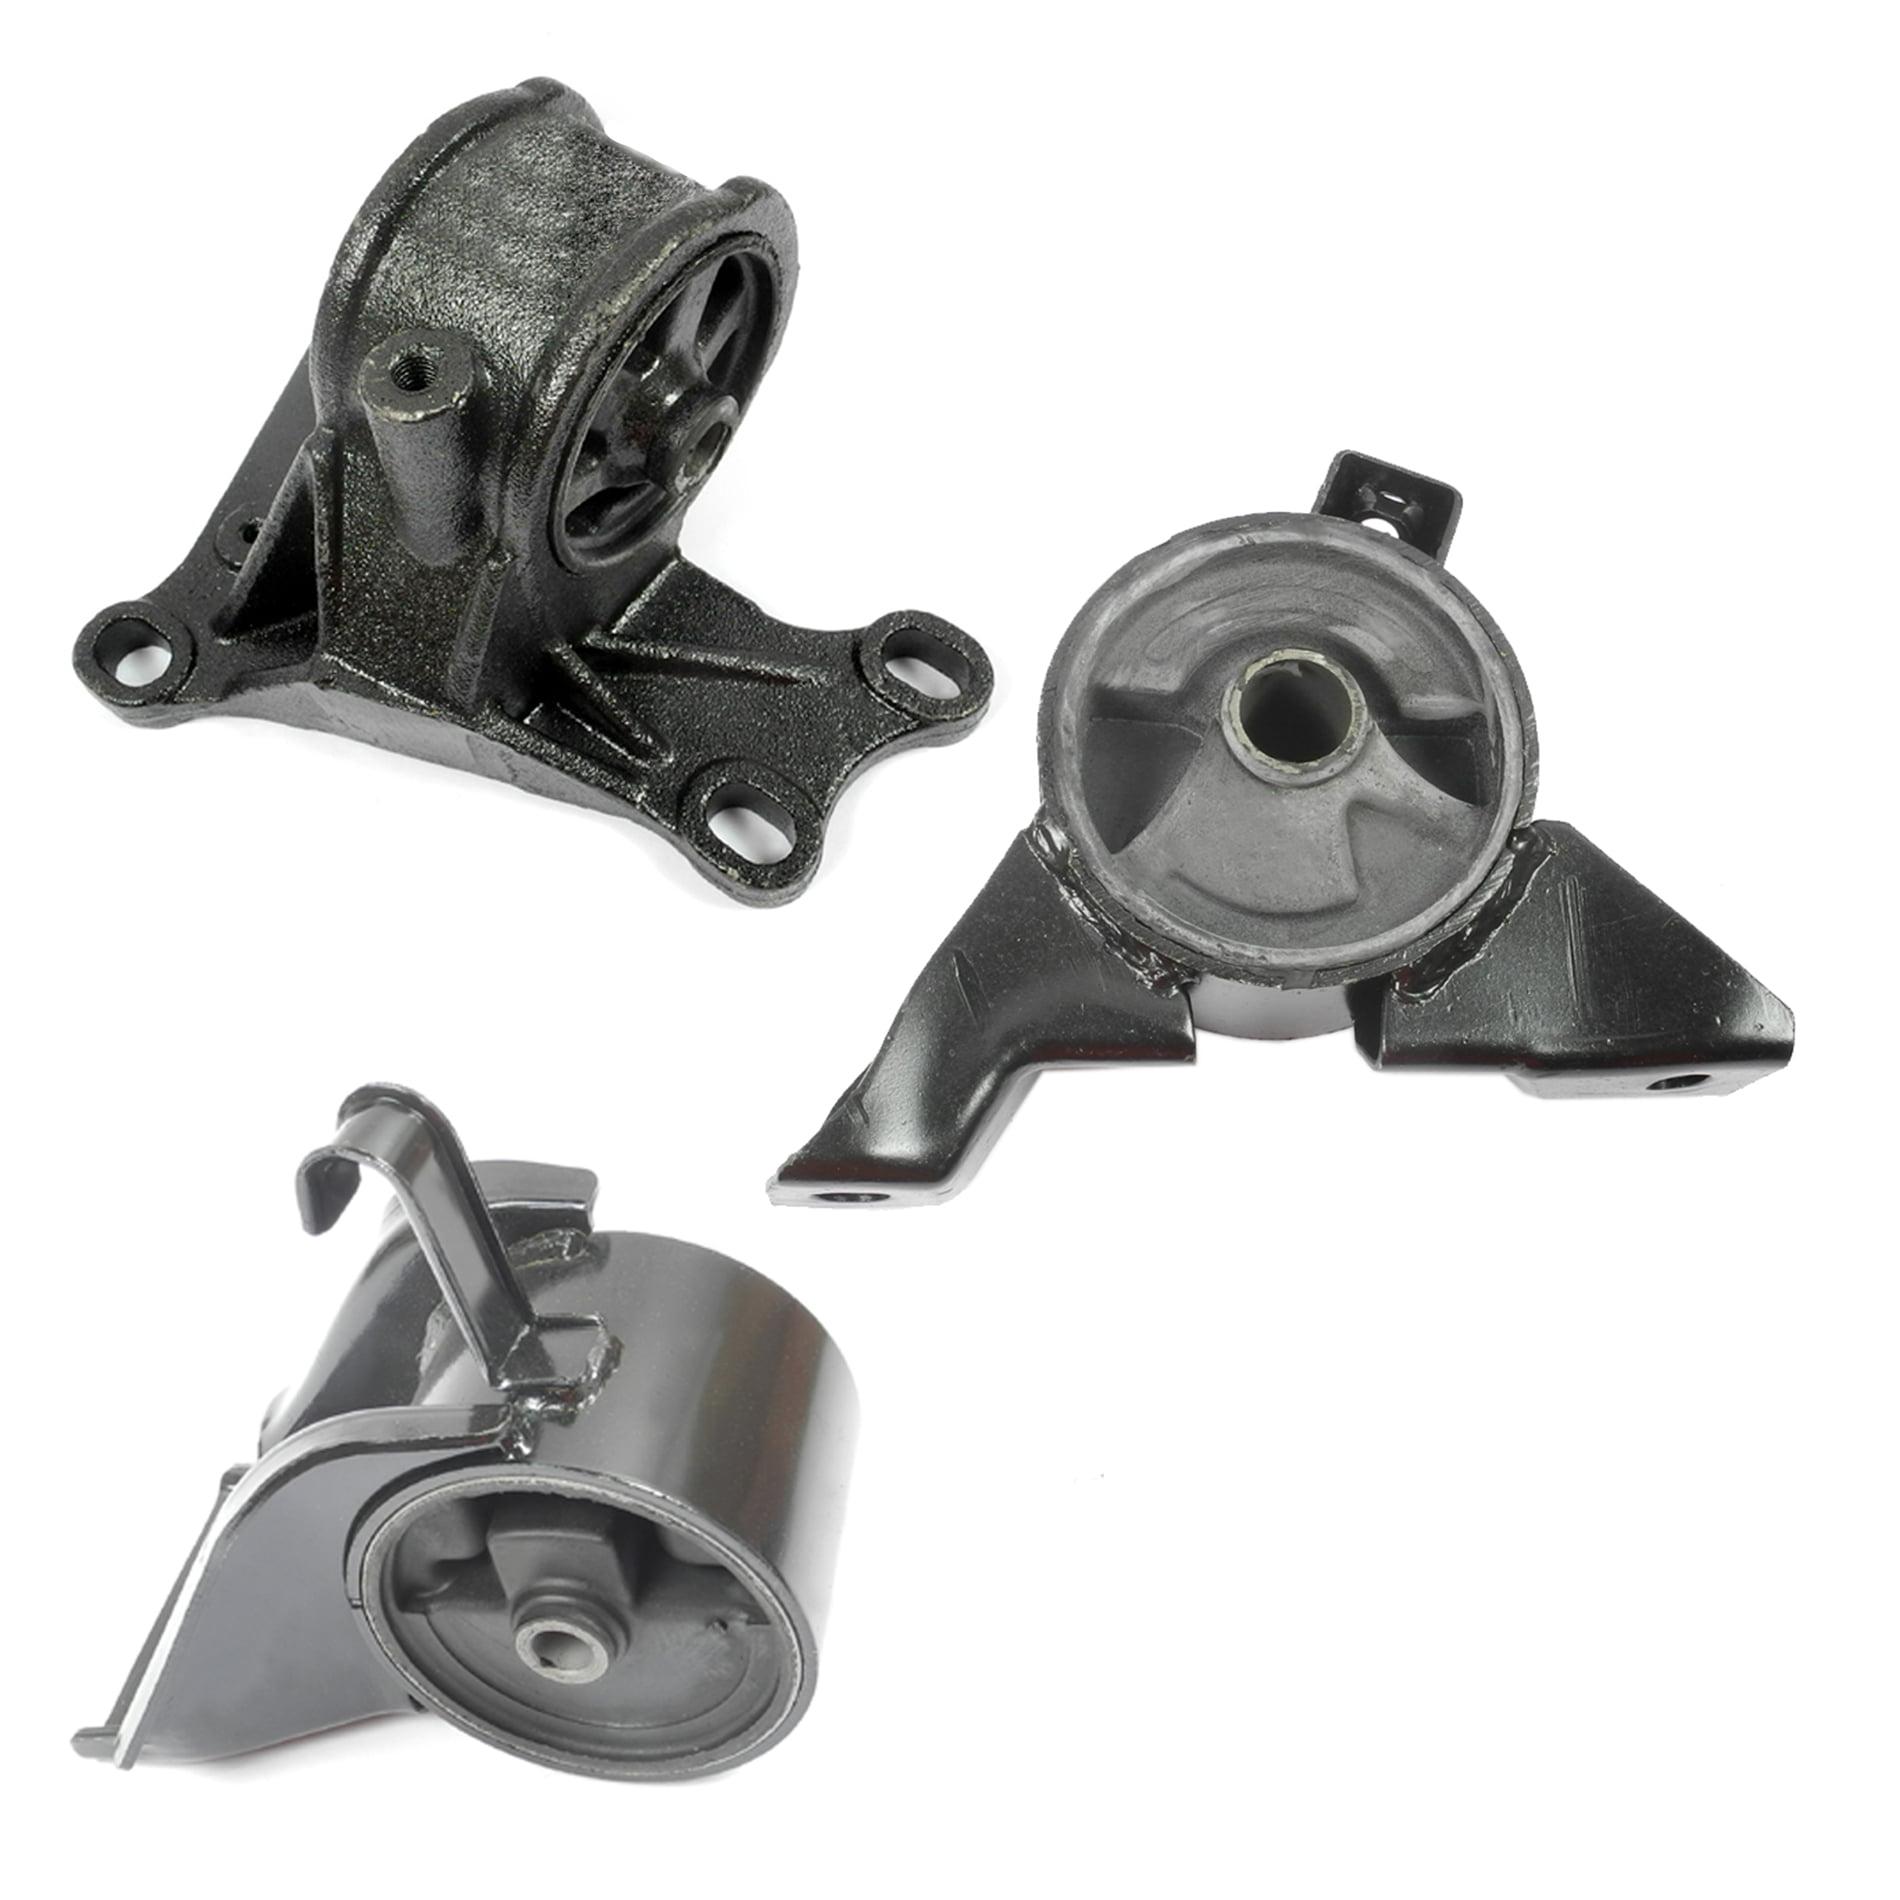 Cf Advance For 2000 Mazda 626 Es Sedan Engine Motor And